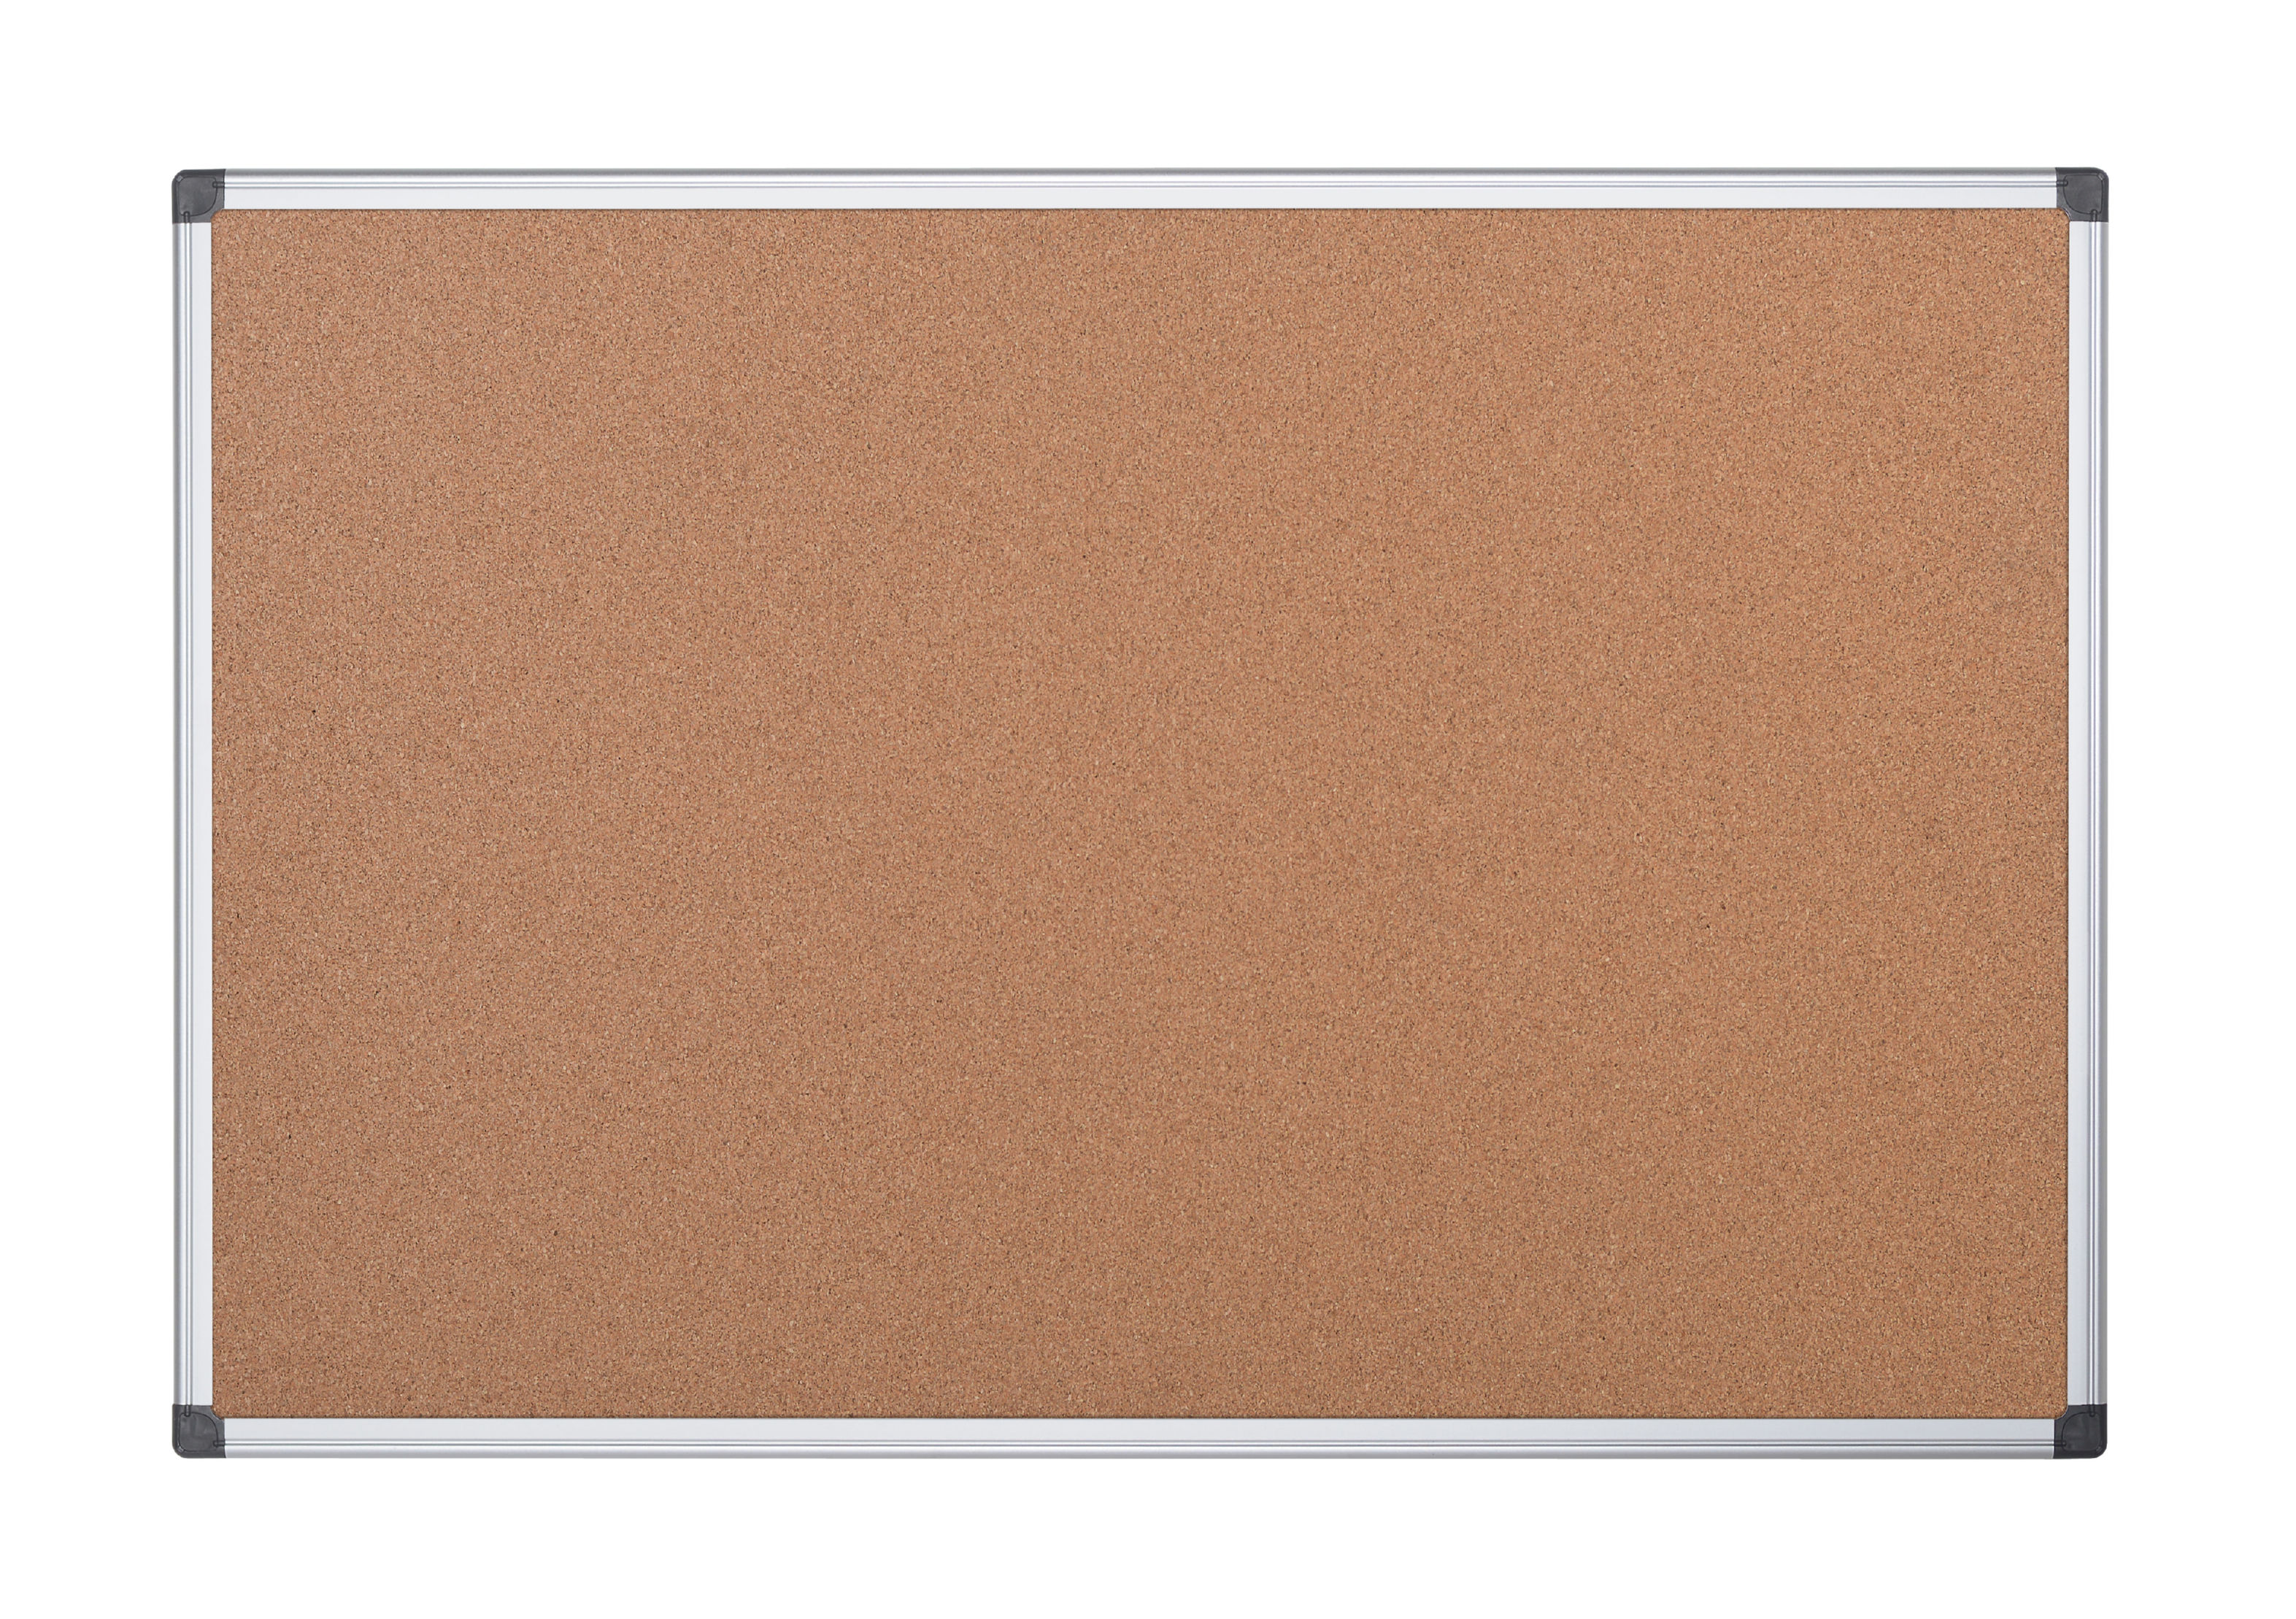 Cork Bi-Office Maya Cork Noticeboard Double Sided Aluminium Frame 900x900mm